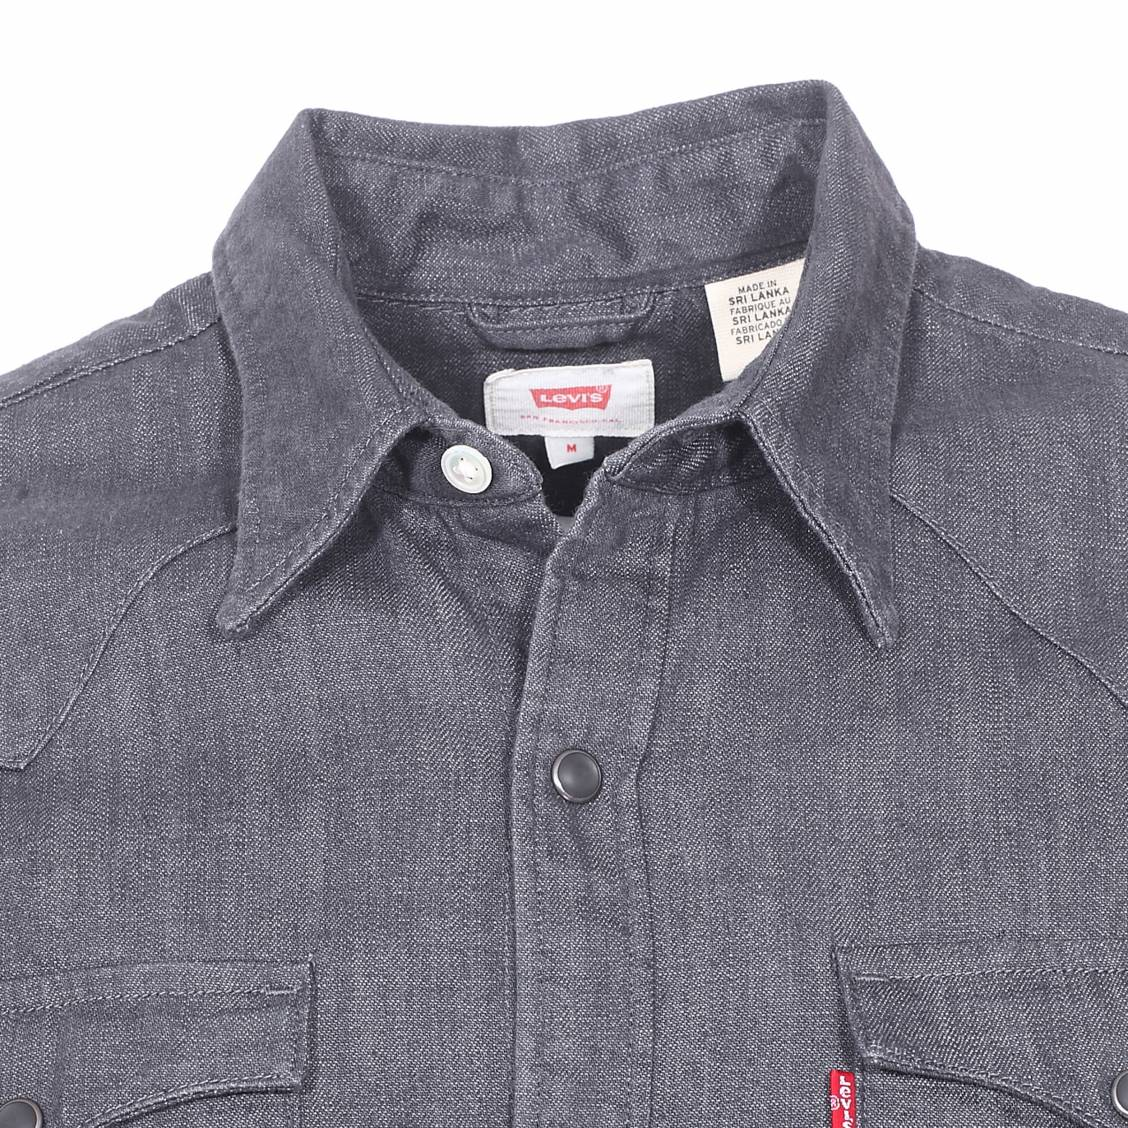 chemise en jean levi 39 s barstow western gray rinse rue. Black Bedroom Furniture Sets. Home Design Ideas